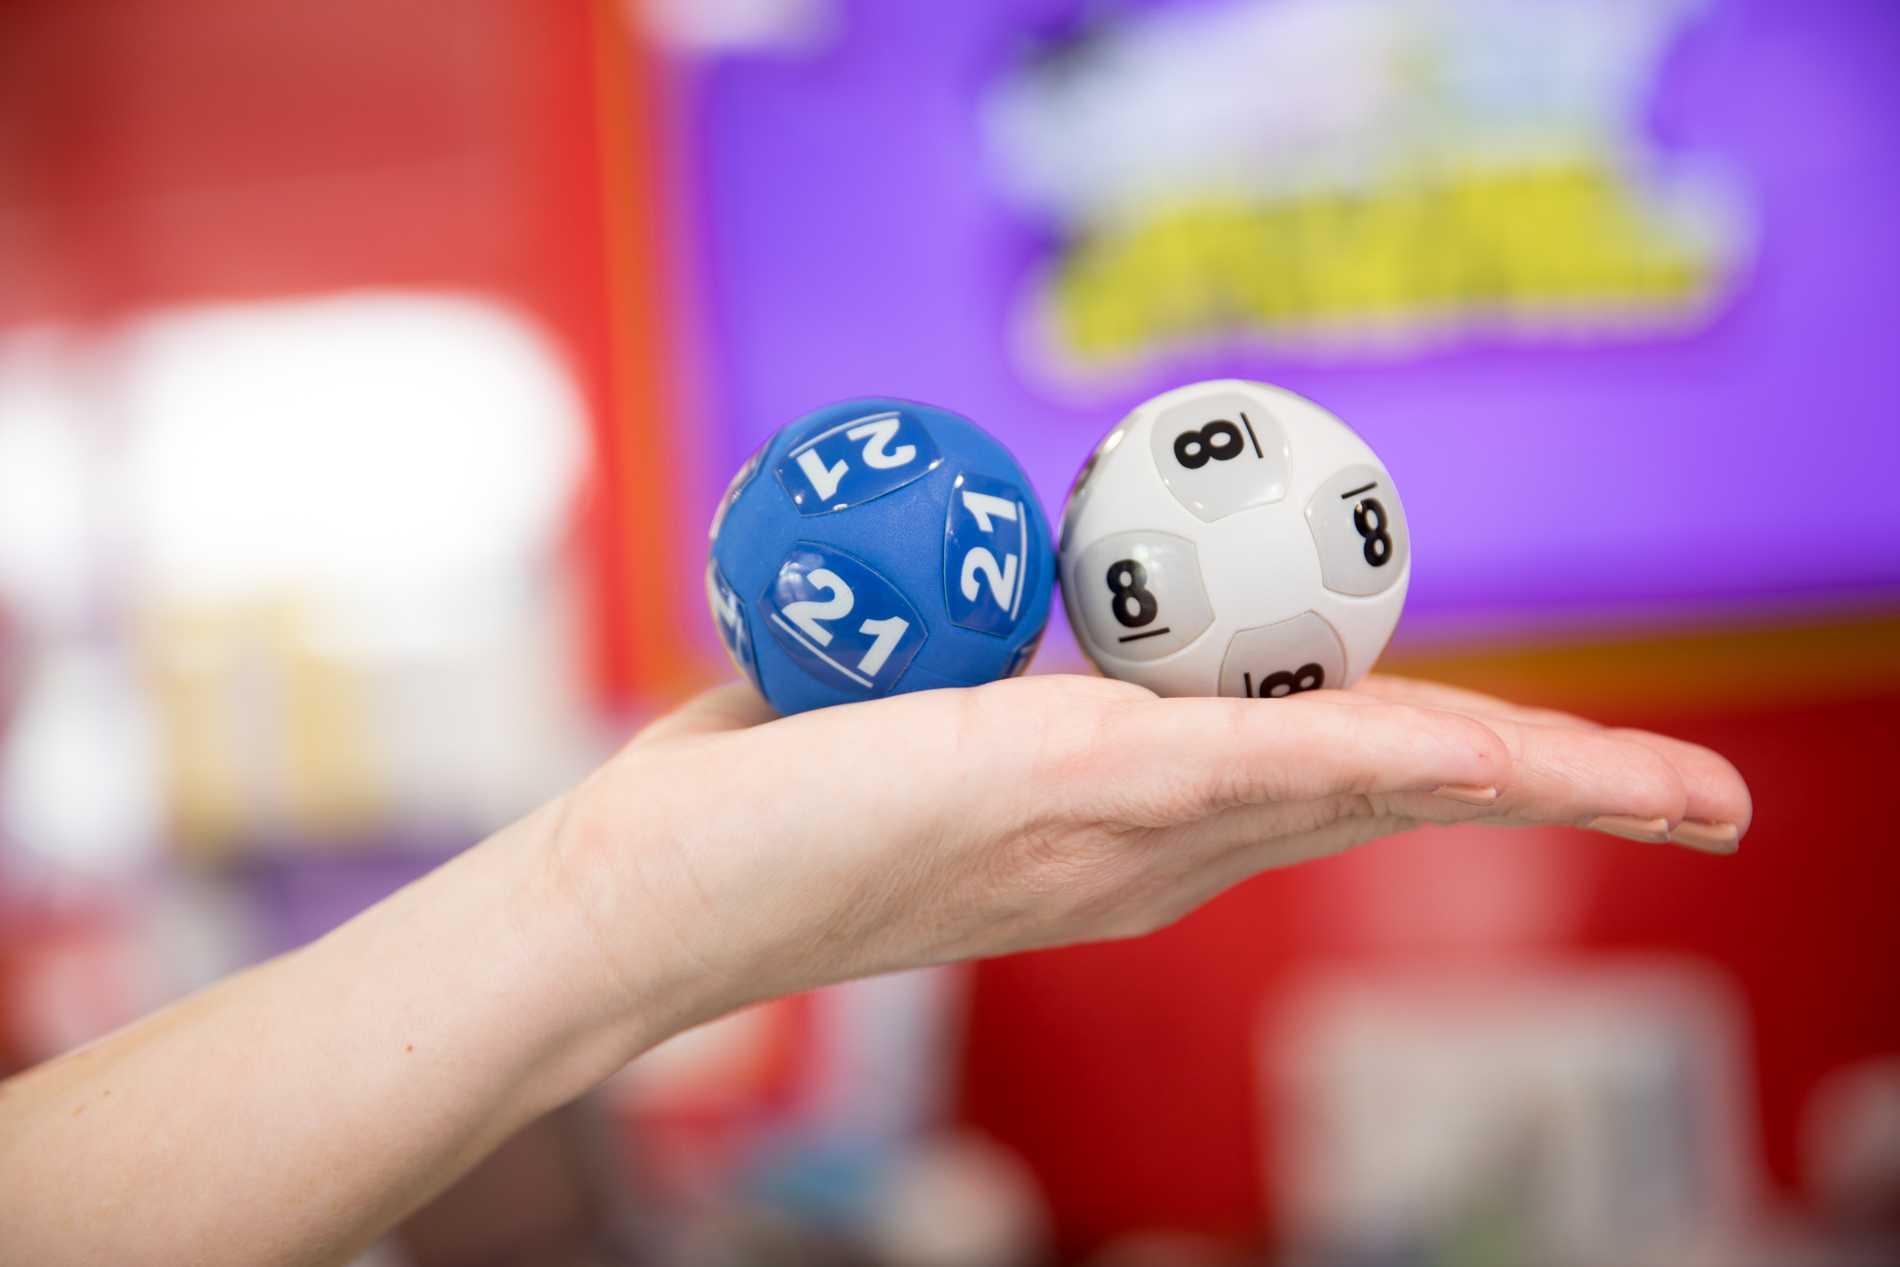 Australia powerball tickets - play aus powerball online